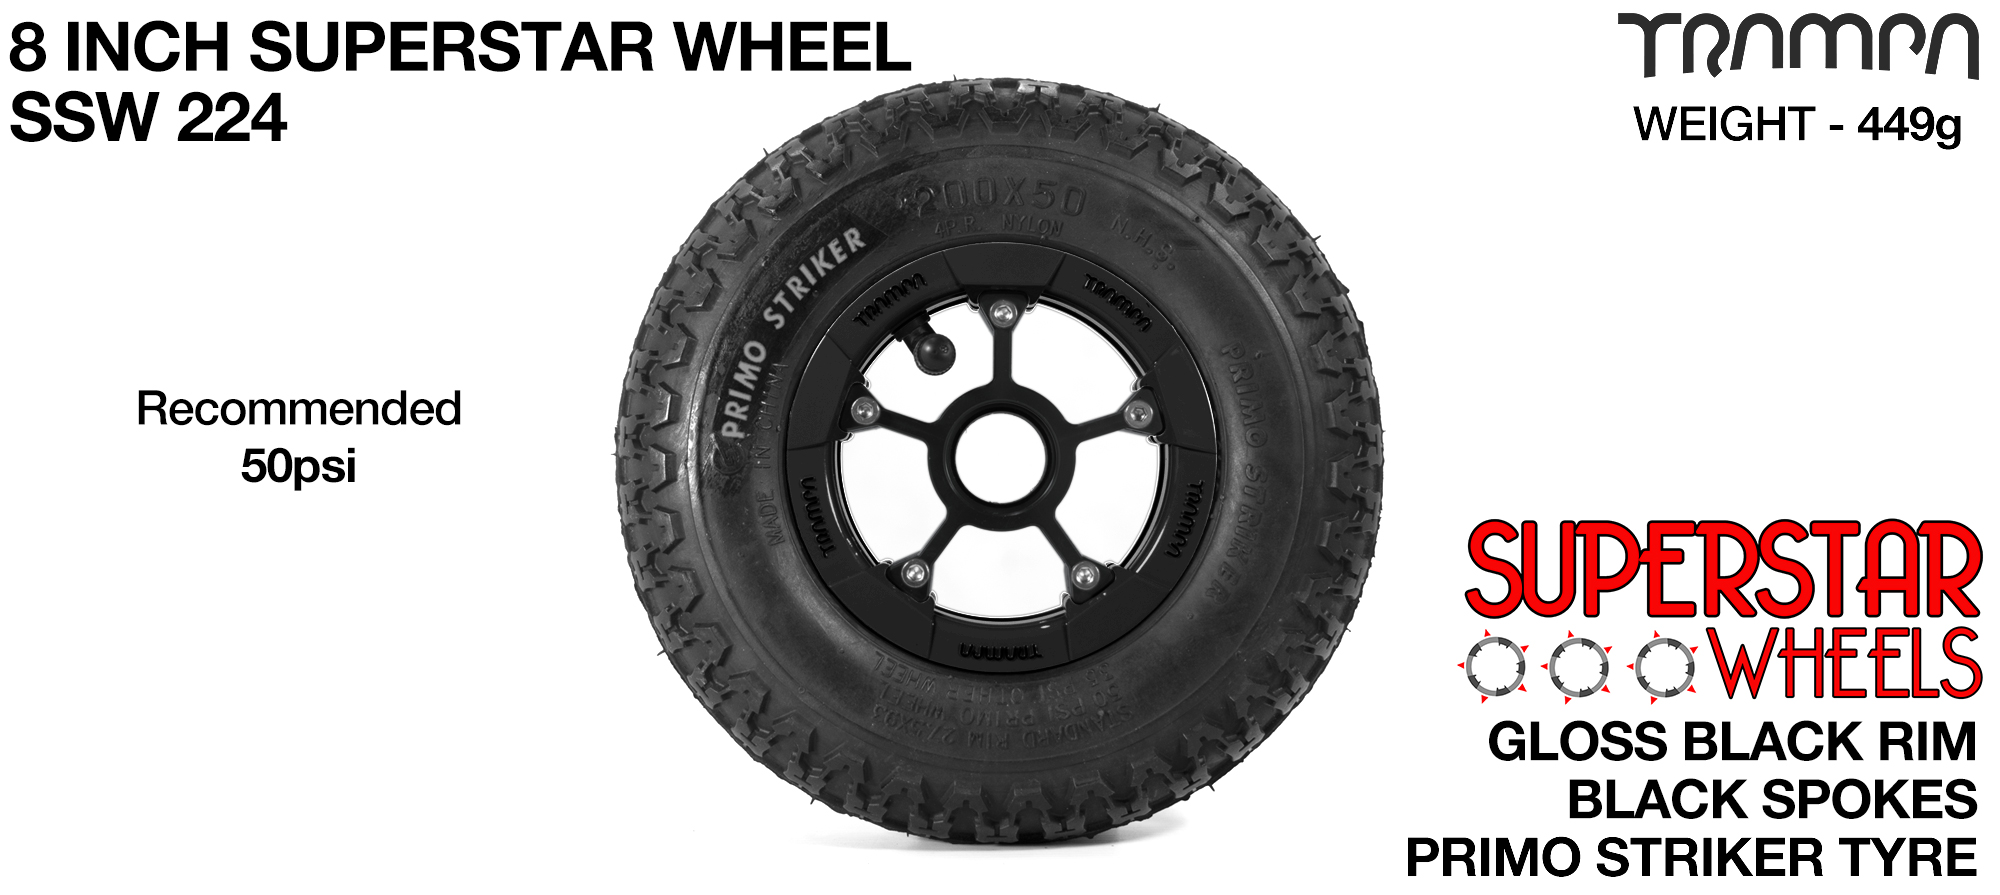 Superstar 8 Inch Wheel - Black Superstar Rim Black Anodised Spokes & Primo Striker 8 Inch Tyre